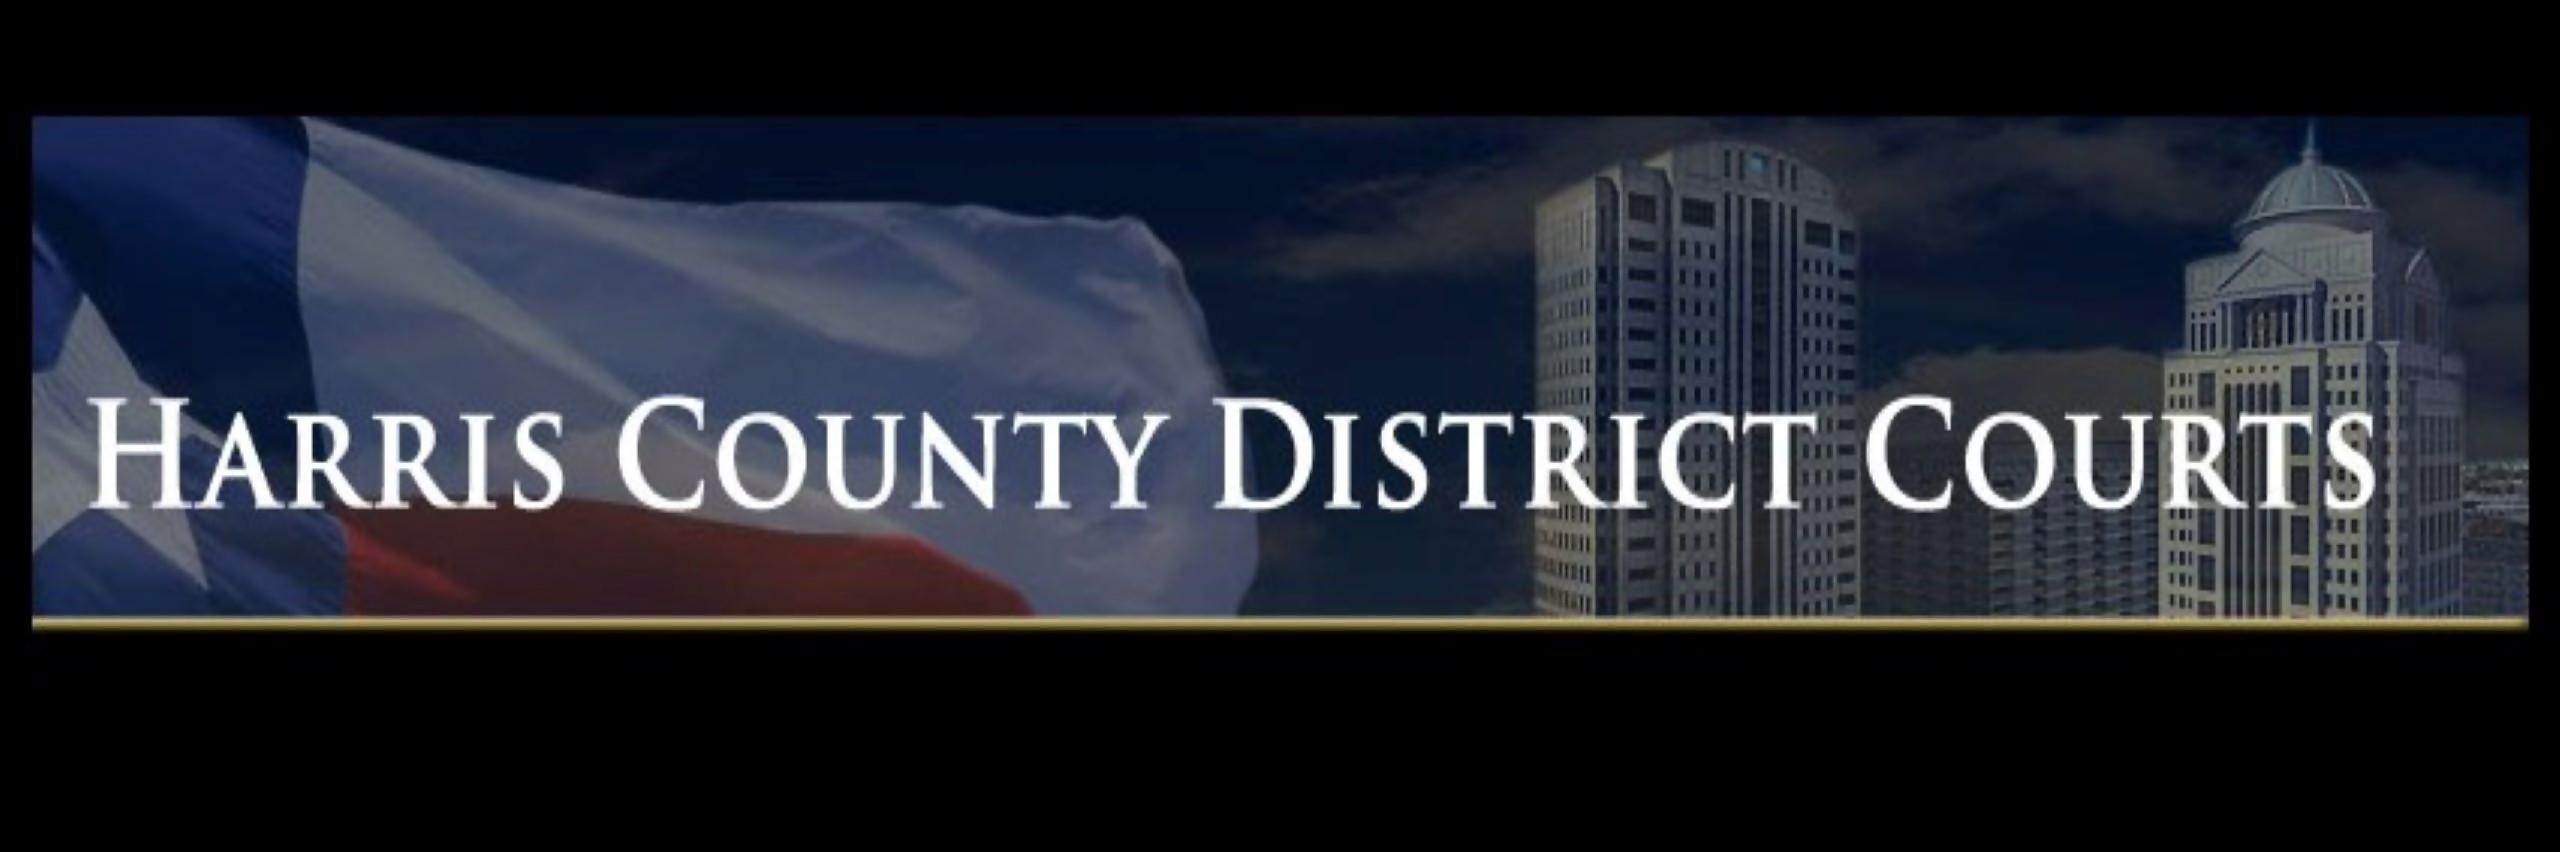 182nd District Court - Live Stream